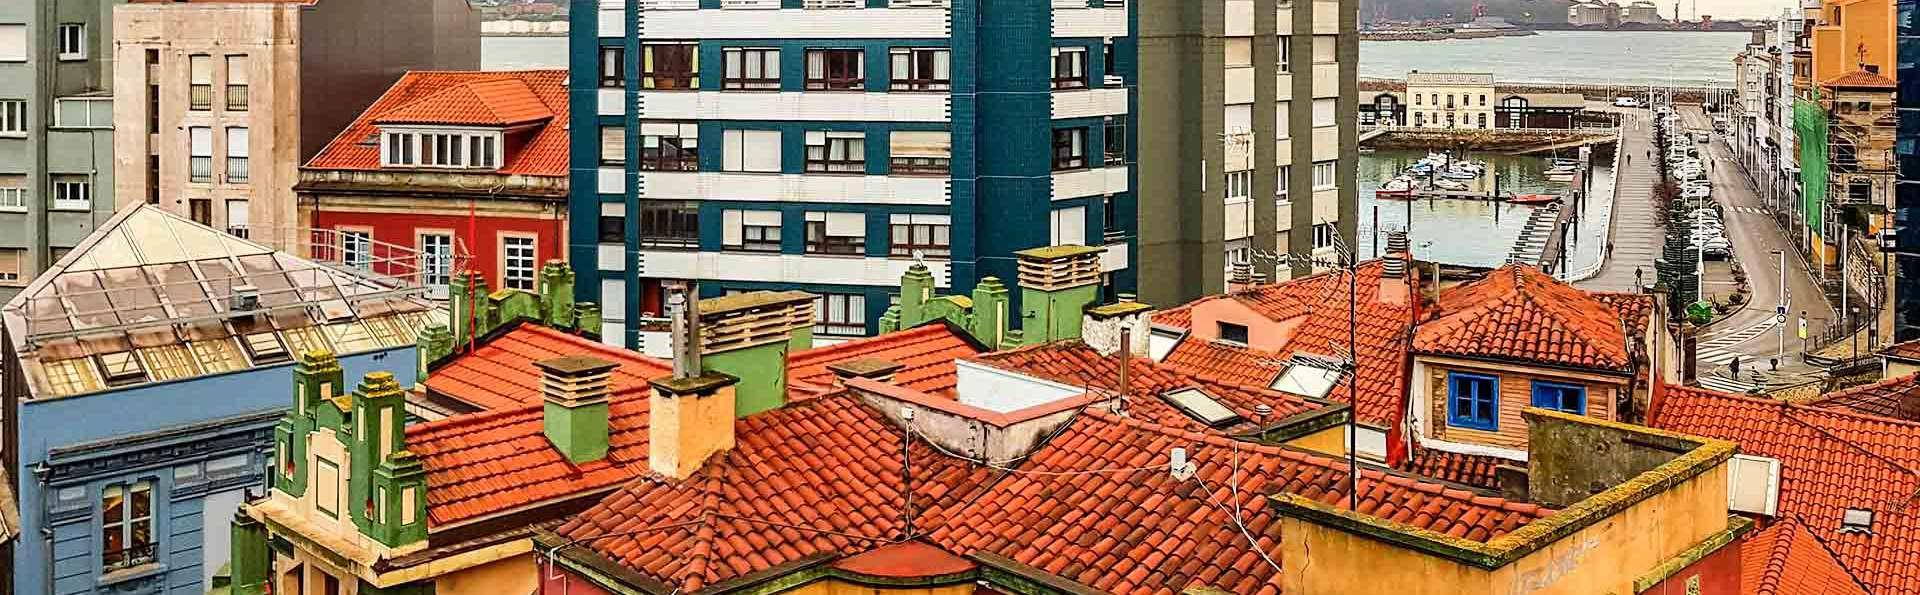 Hotel City House Pathos - EDIT_Vistas_01.jpg